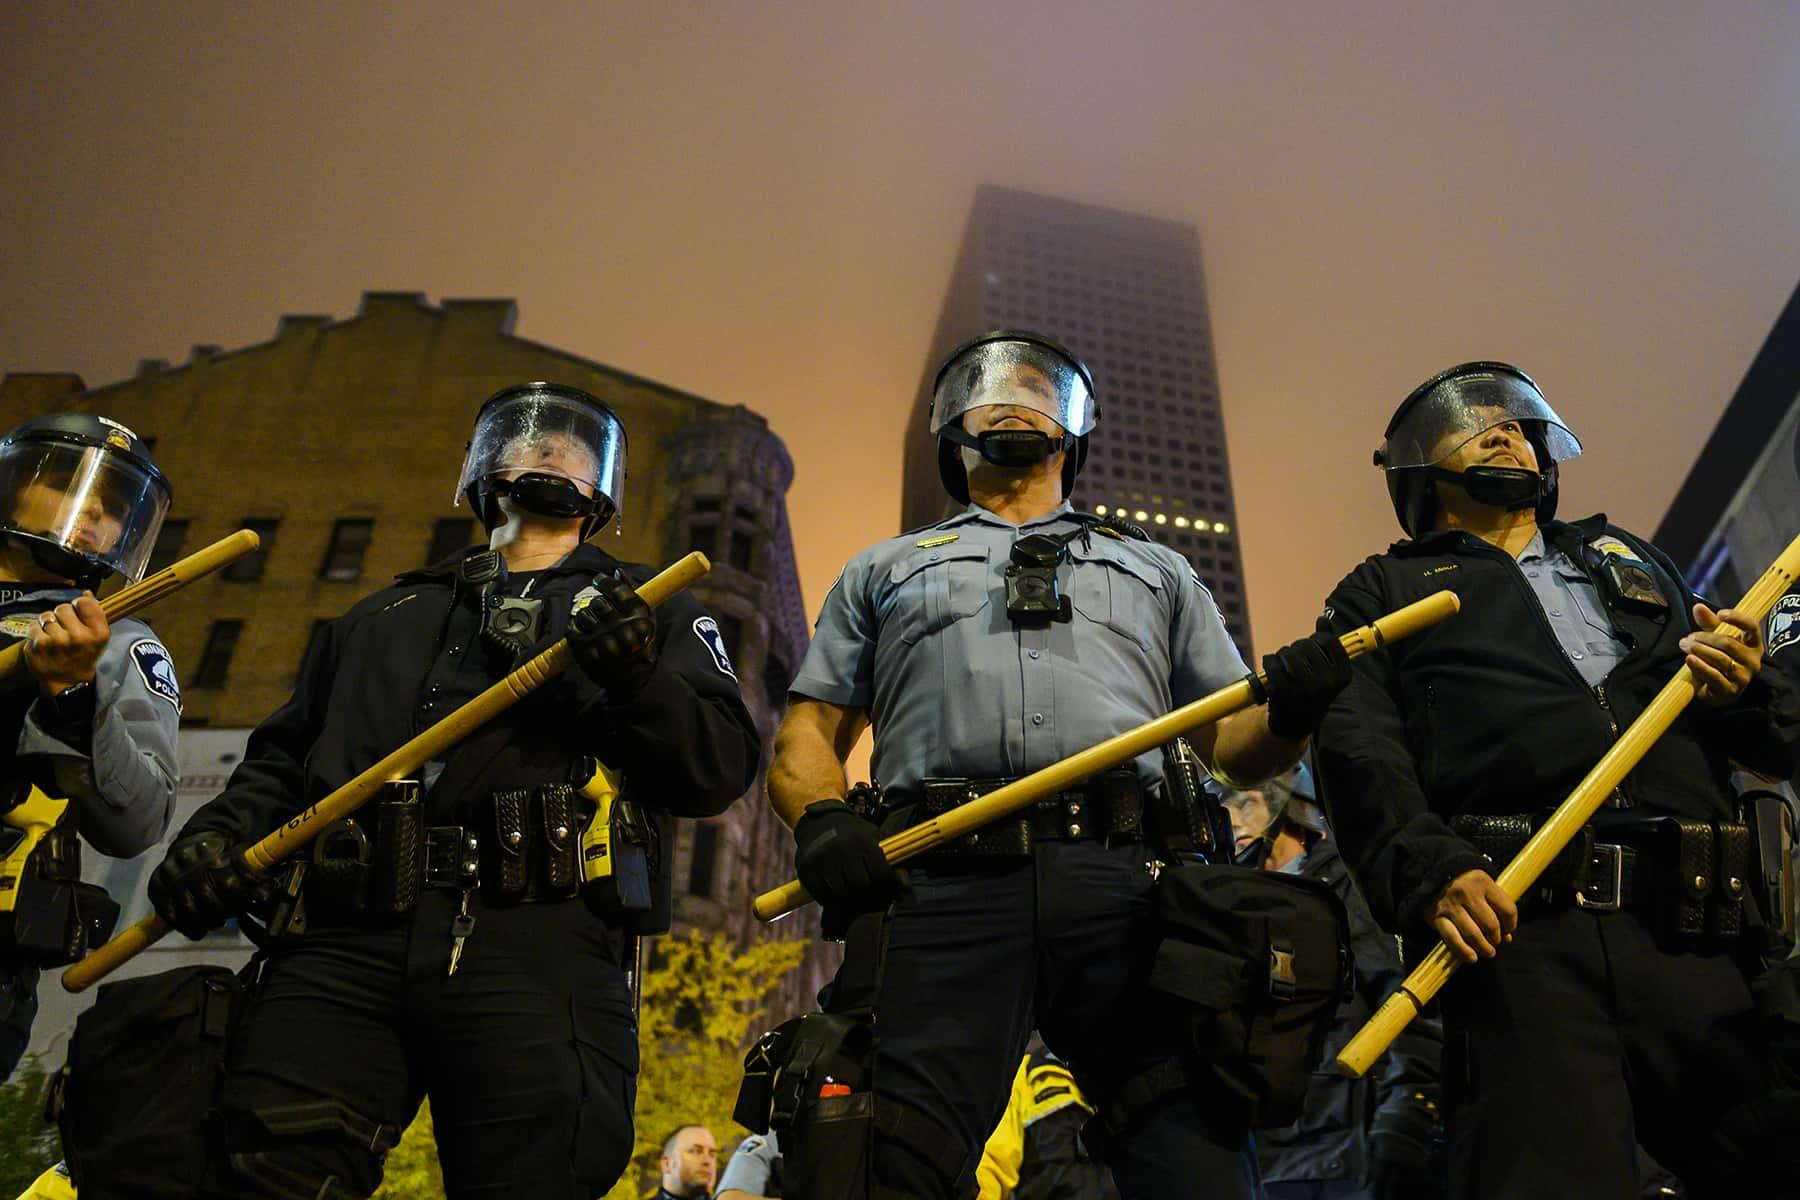 082520_policeunions_02